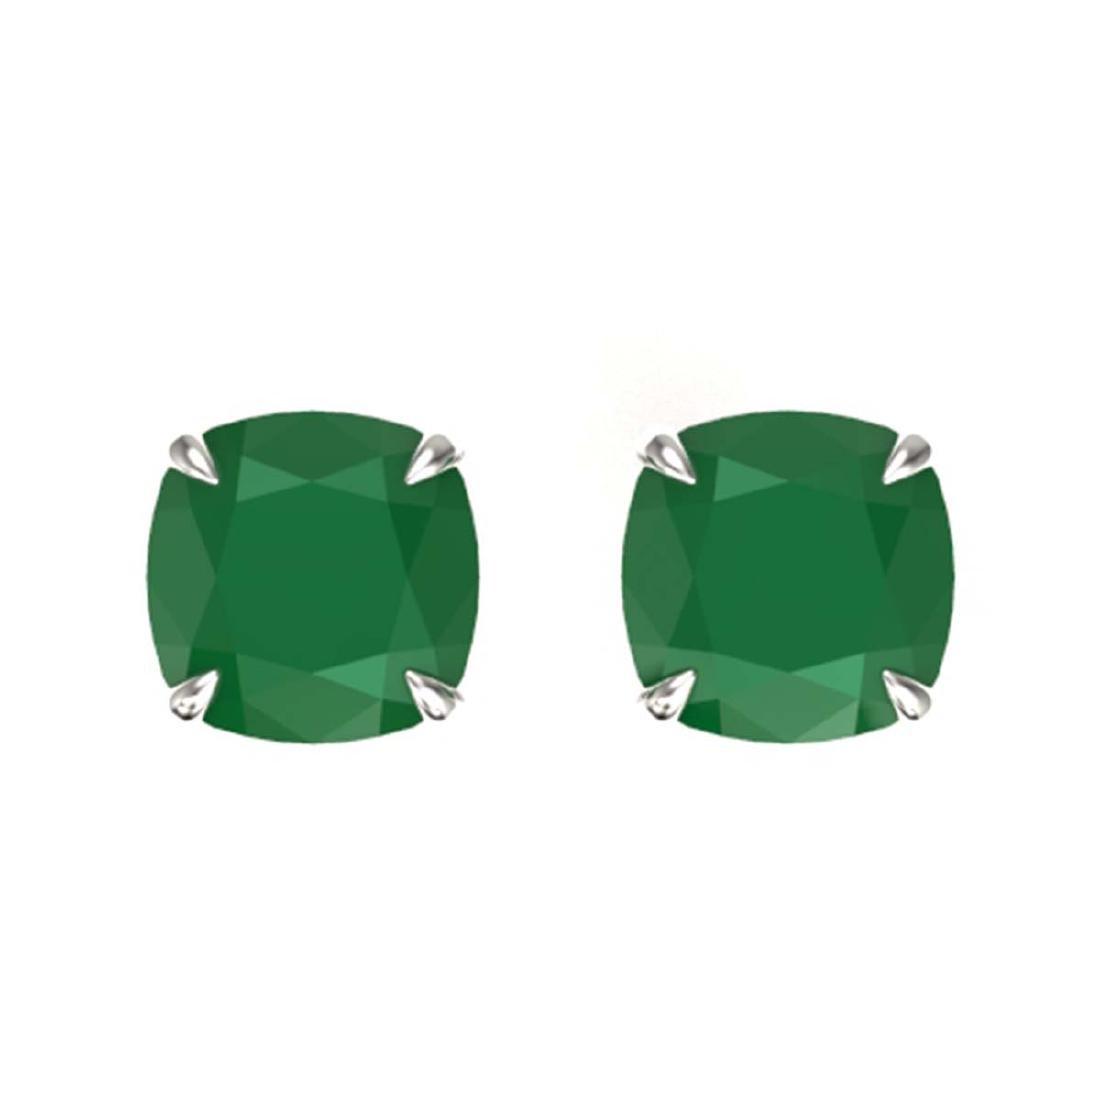 4 ctw Cushion Cut Emerald Stud Earrings 18K White Gold